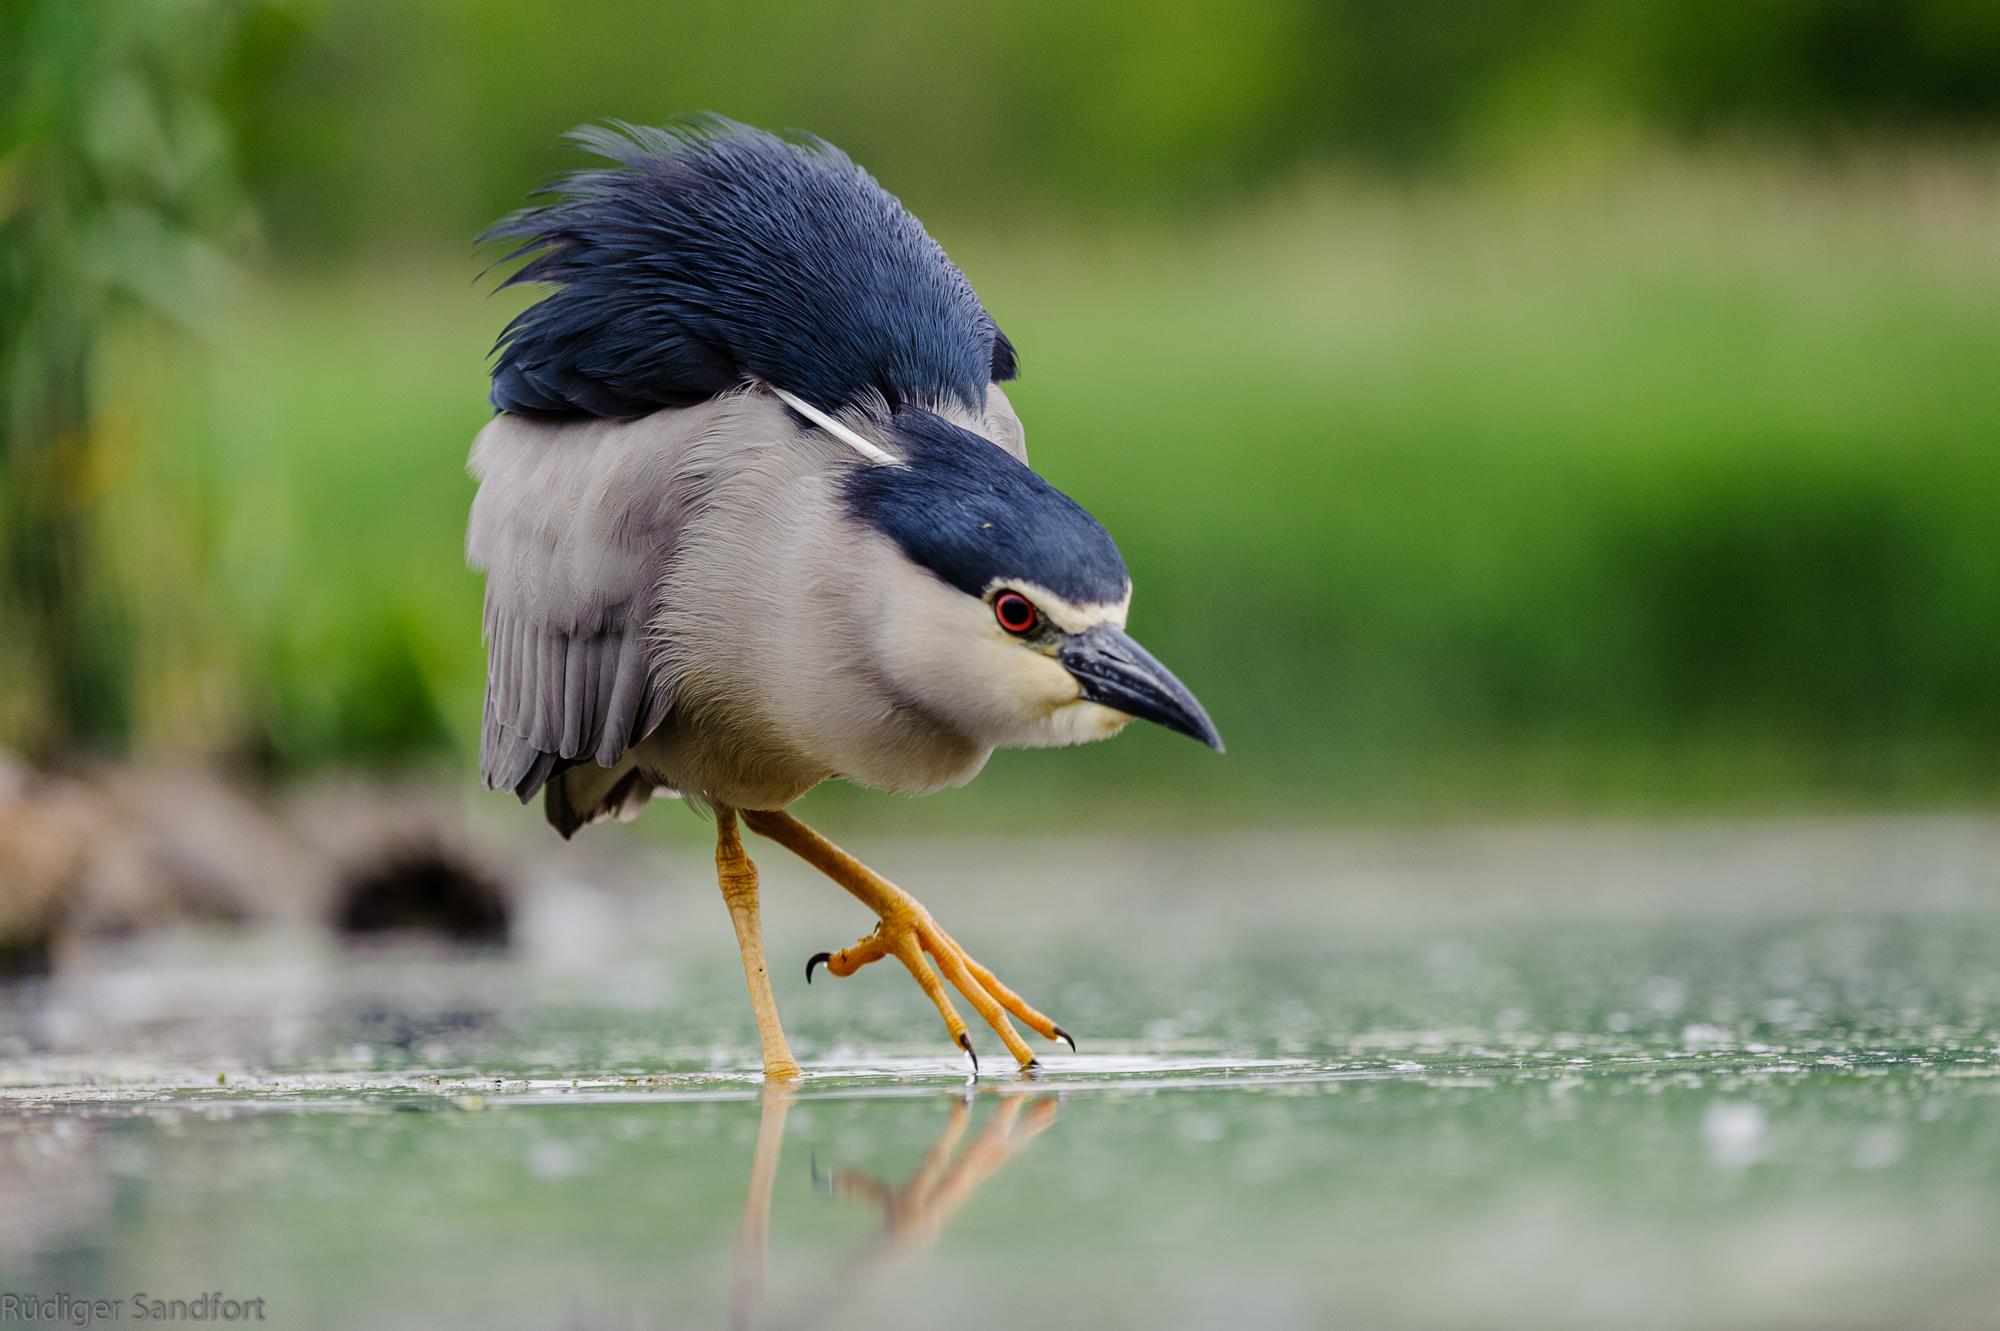 Black-crowned Night Heron / Nachtreiher